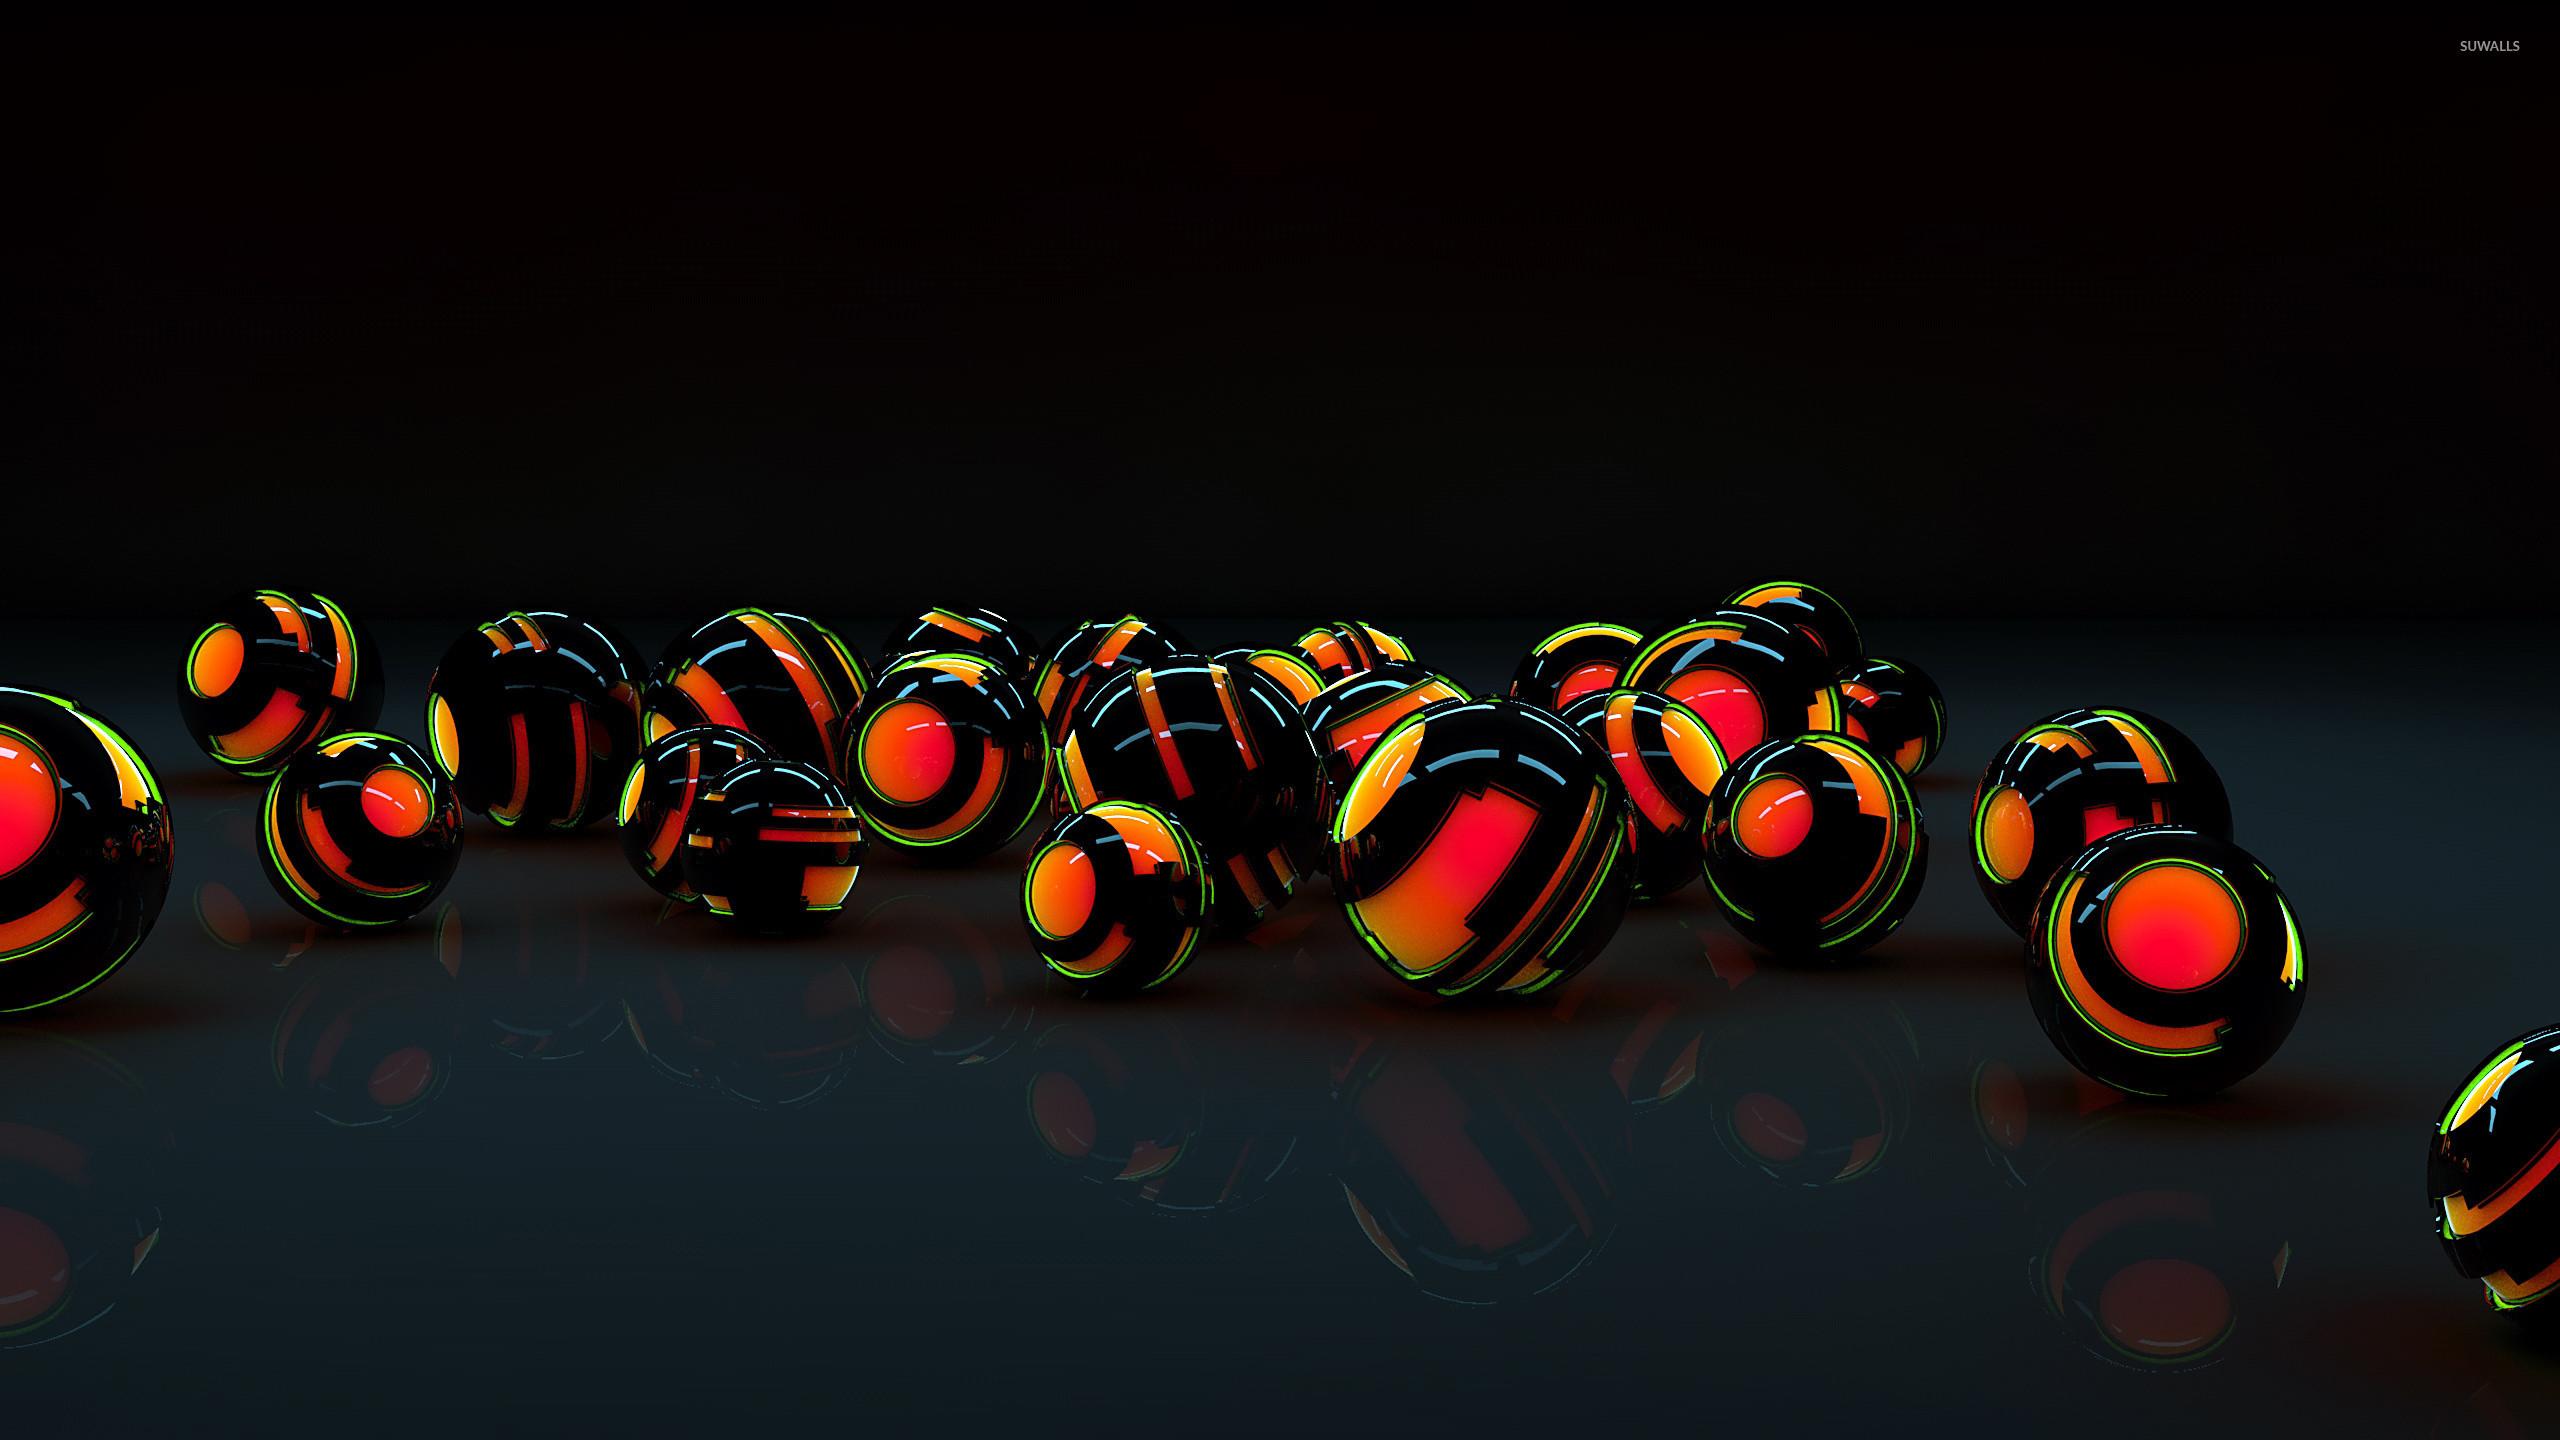 Black shells protecting the orange orbs wallpaper